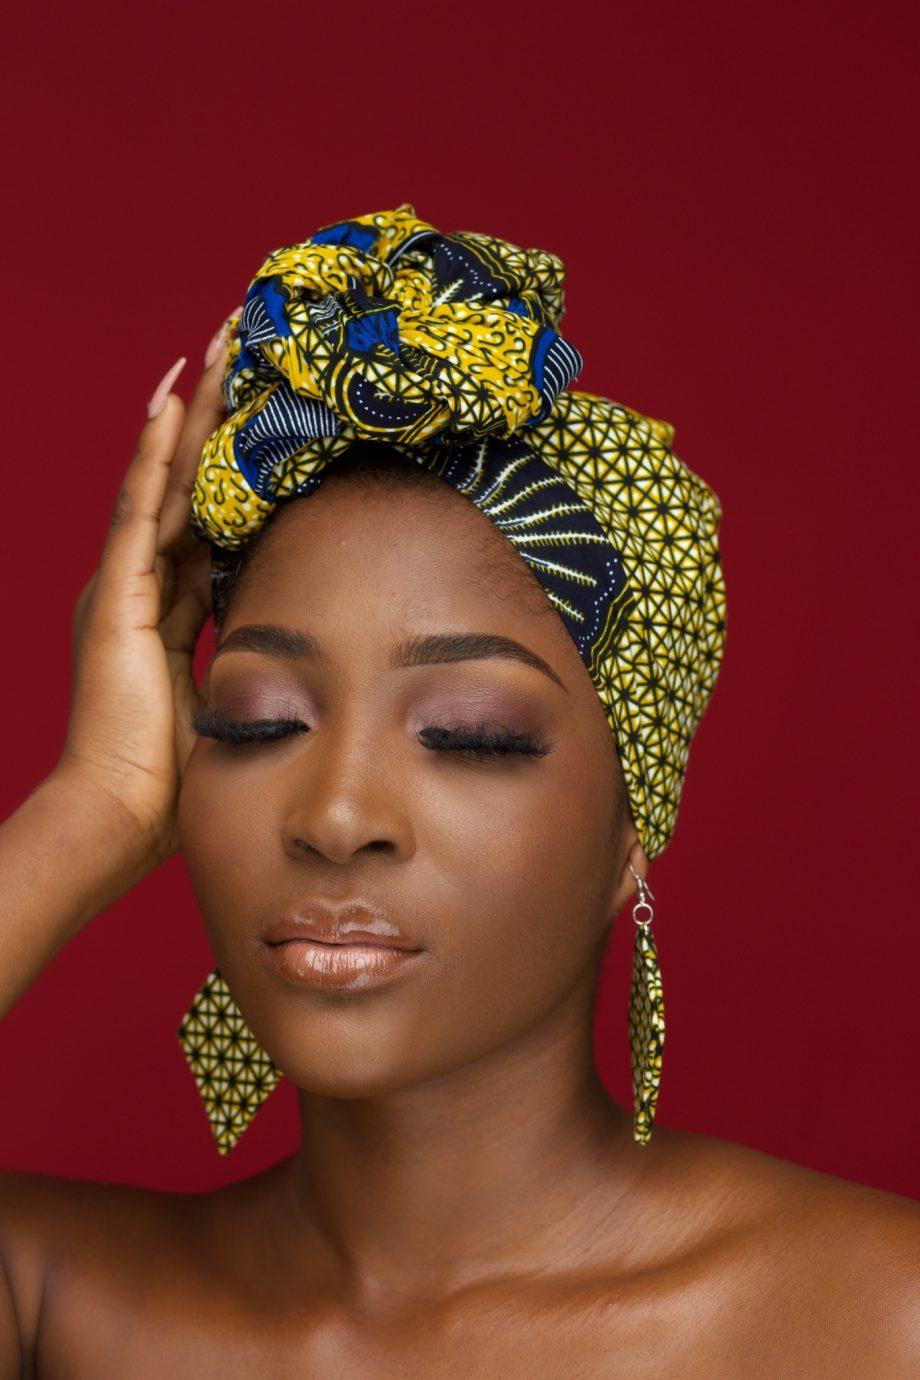 African Head Wrap in Yellow and Blue Ankara Print - KETA by Naborhi